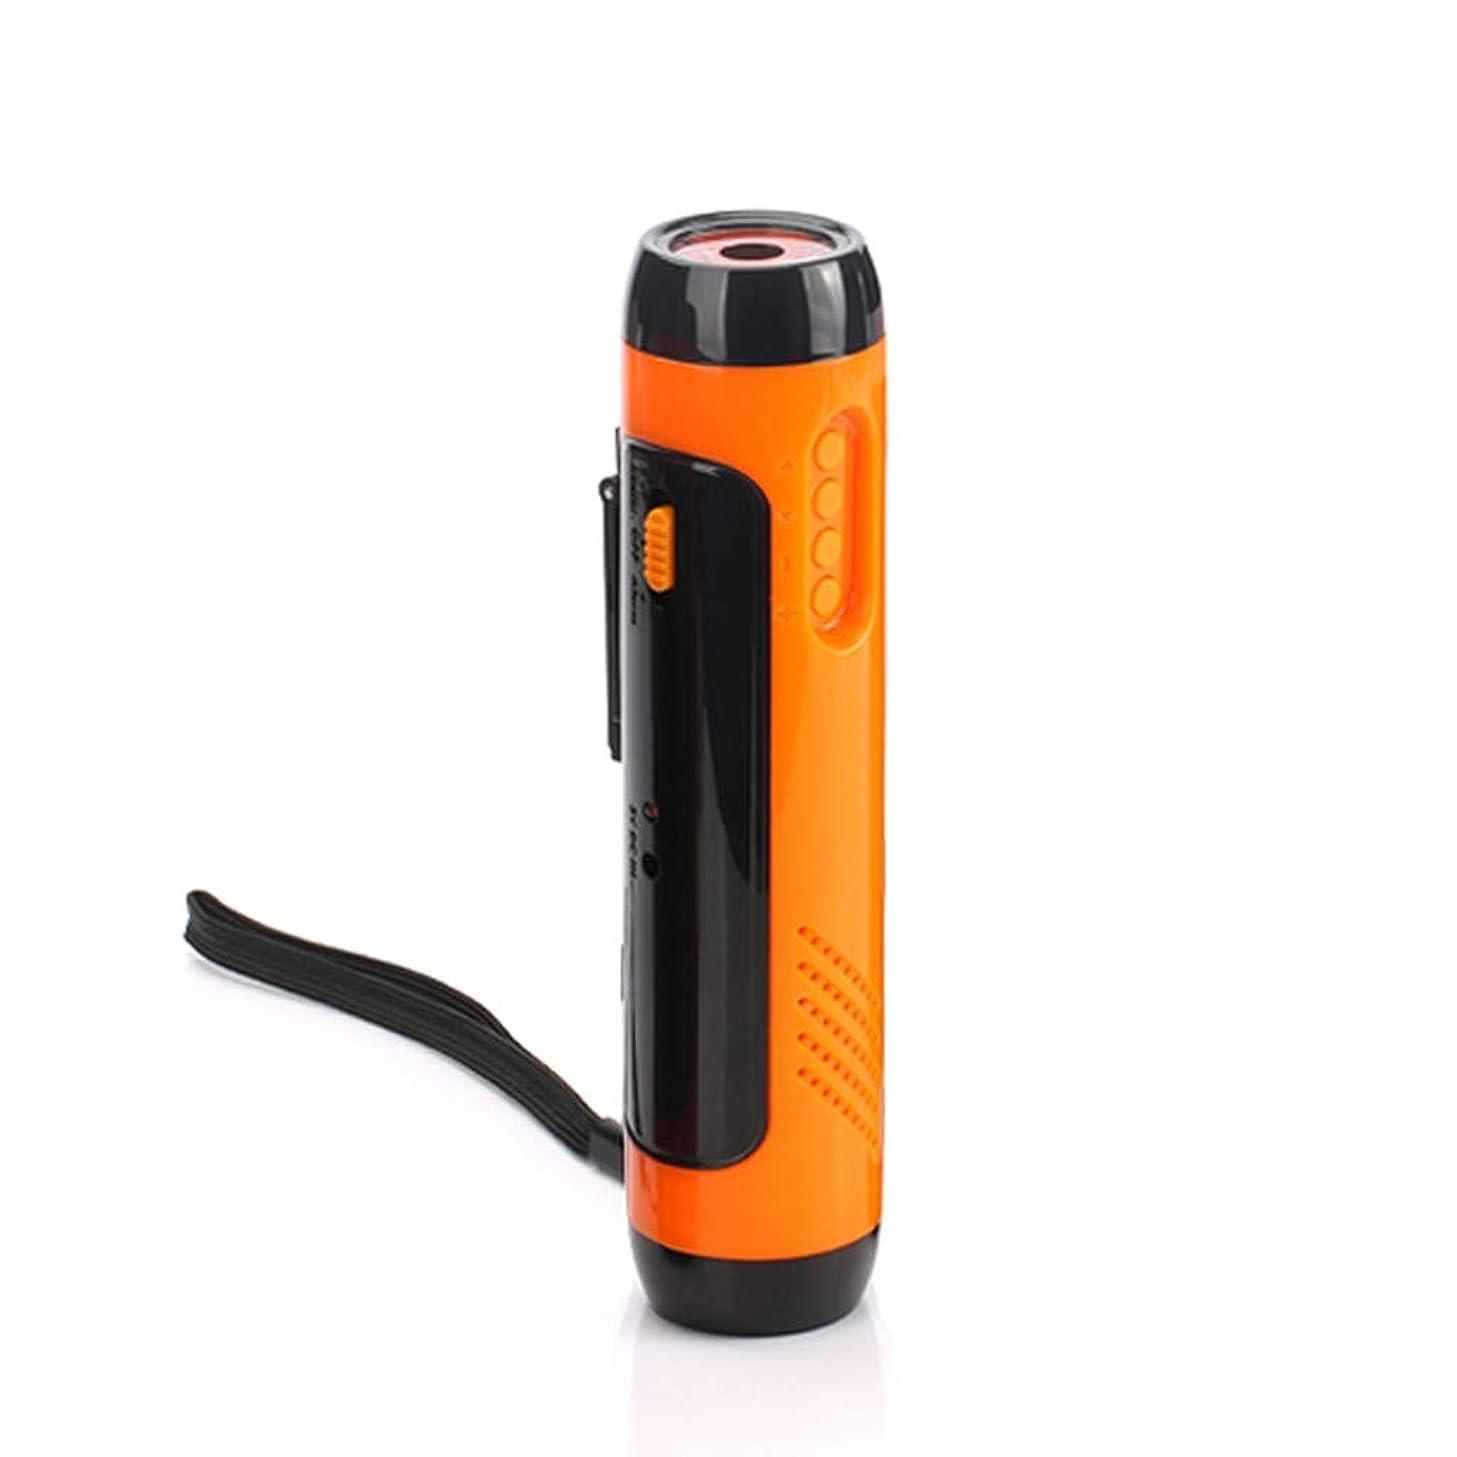 flashlights high lumens-Alarm FM Radio Mobile Phone Charging Hand-operated Power Generat